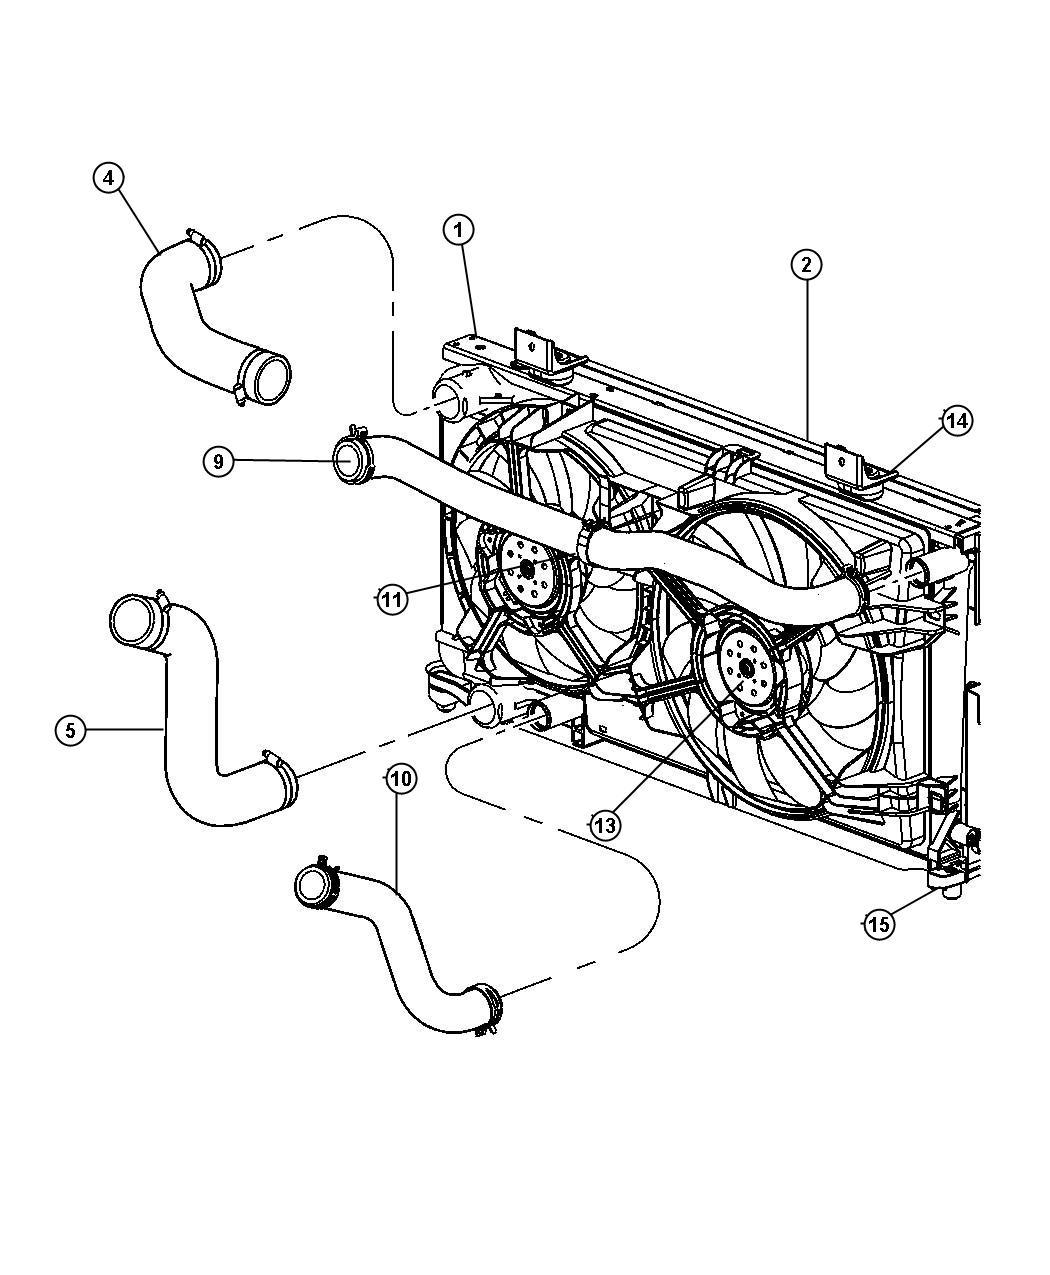 Dodge Caravan Radiator. Engine cooling. Magneti-marelli